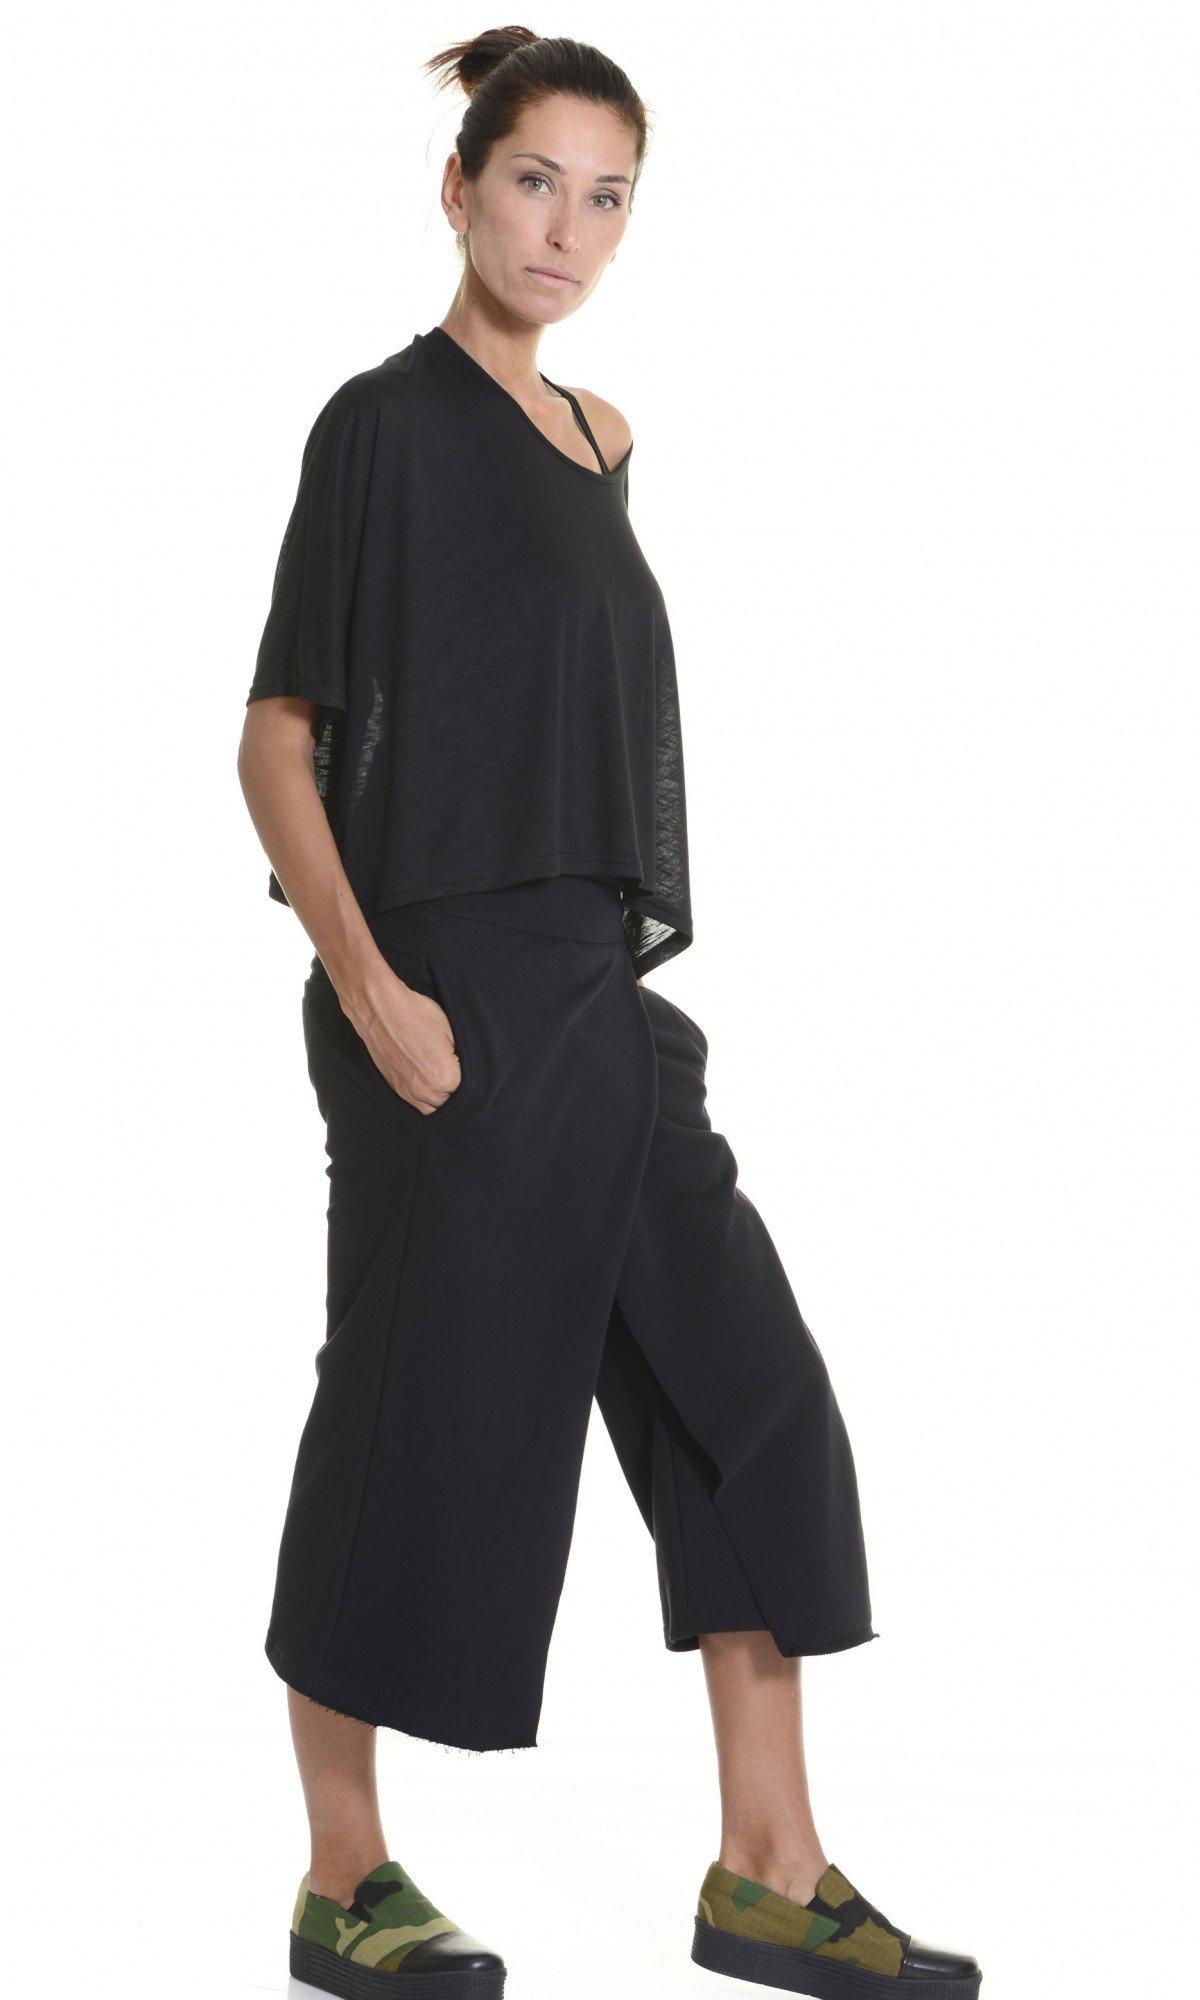 Loose Cotton Black Skirt like Pants A05320